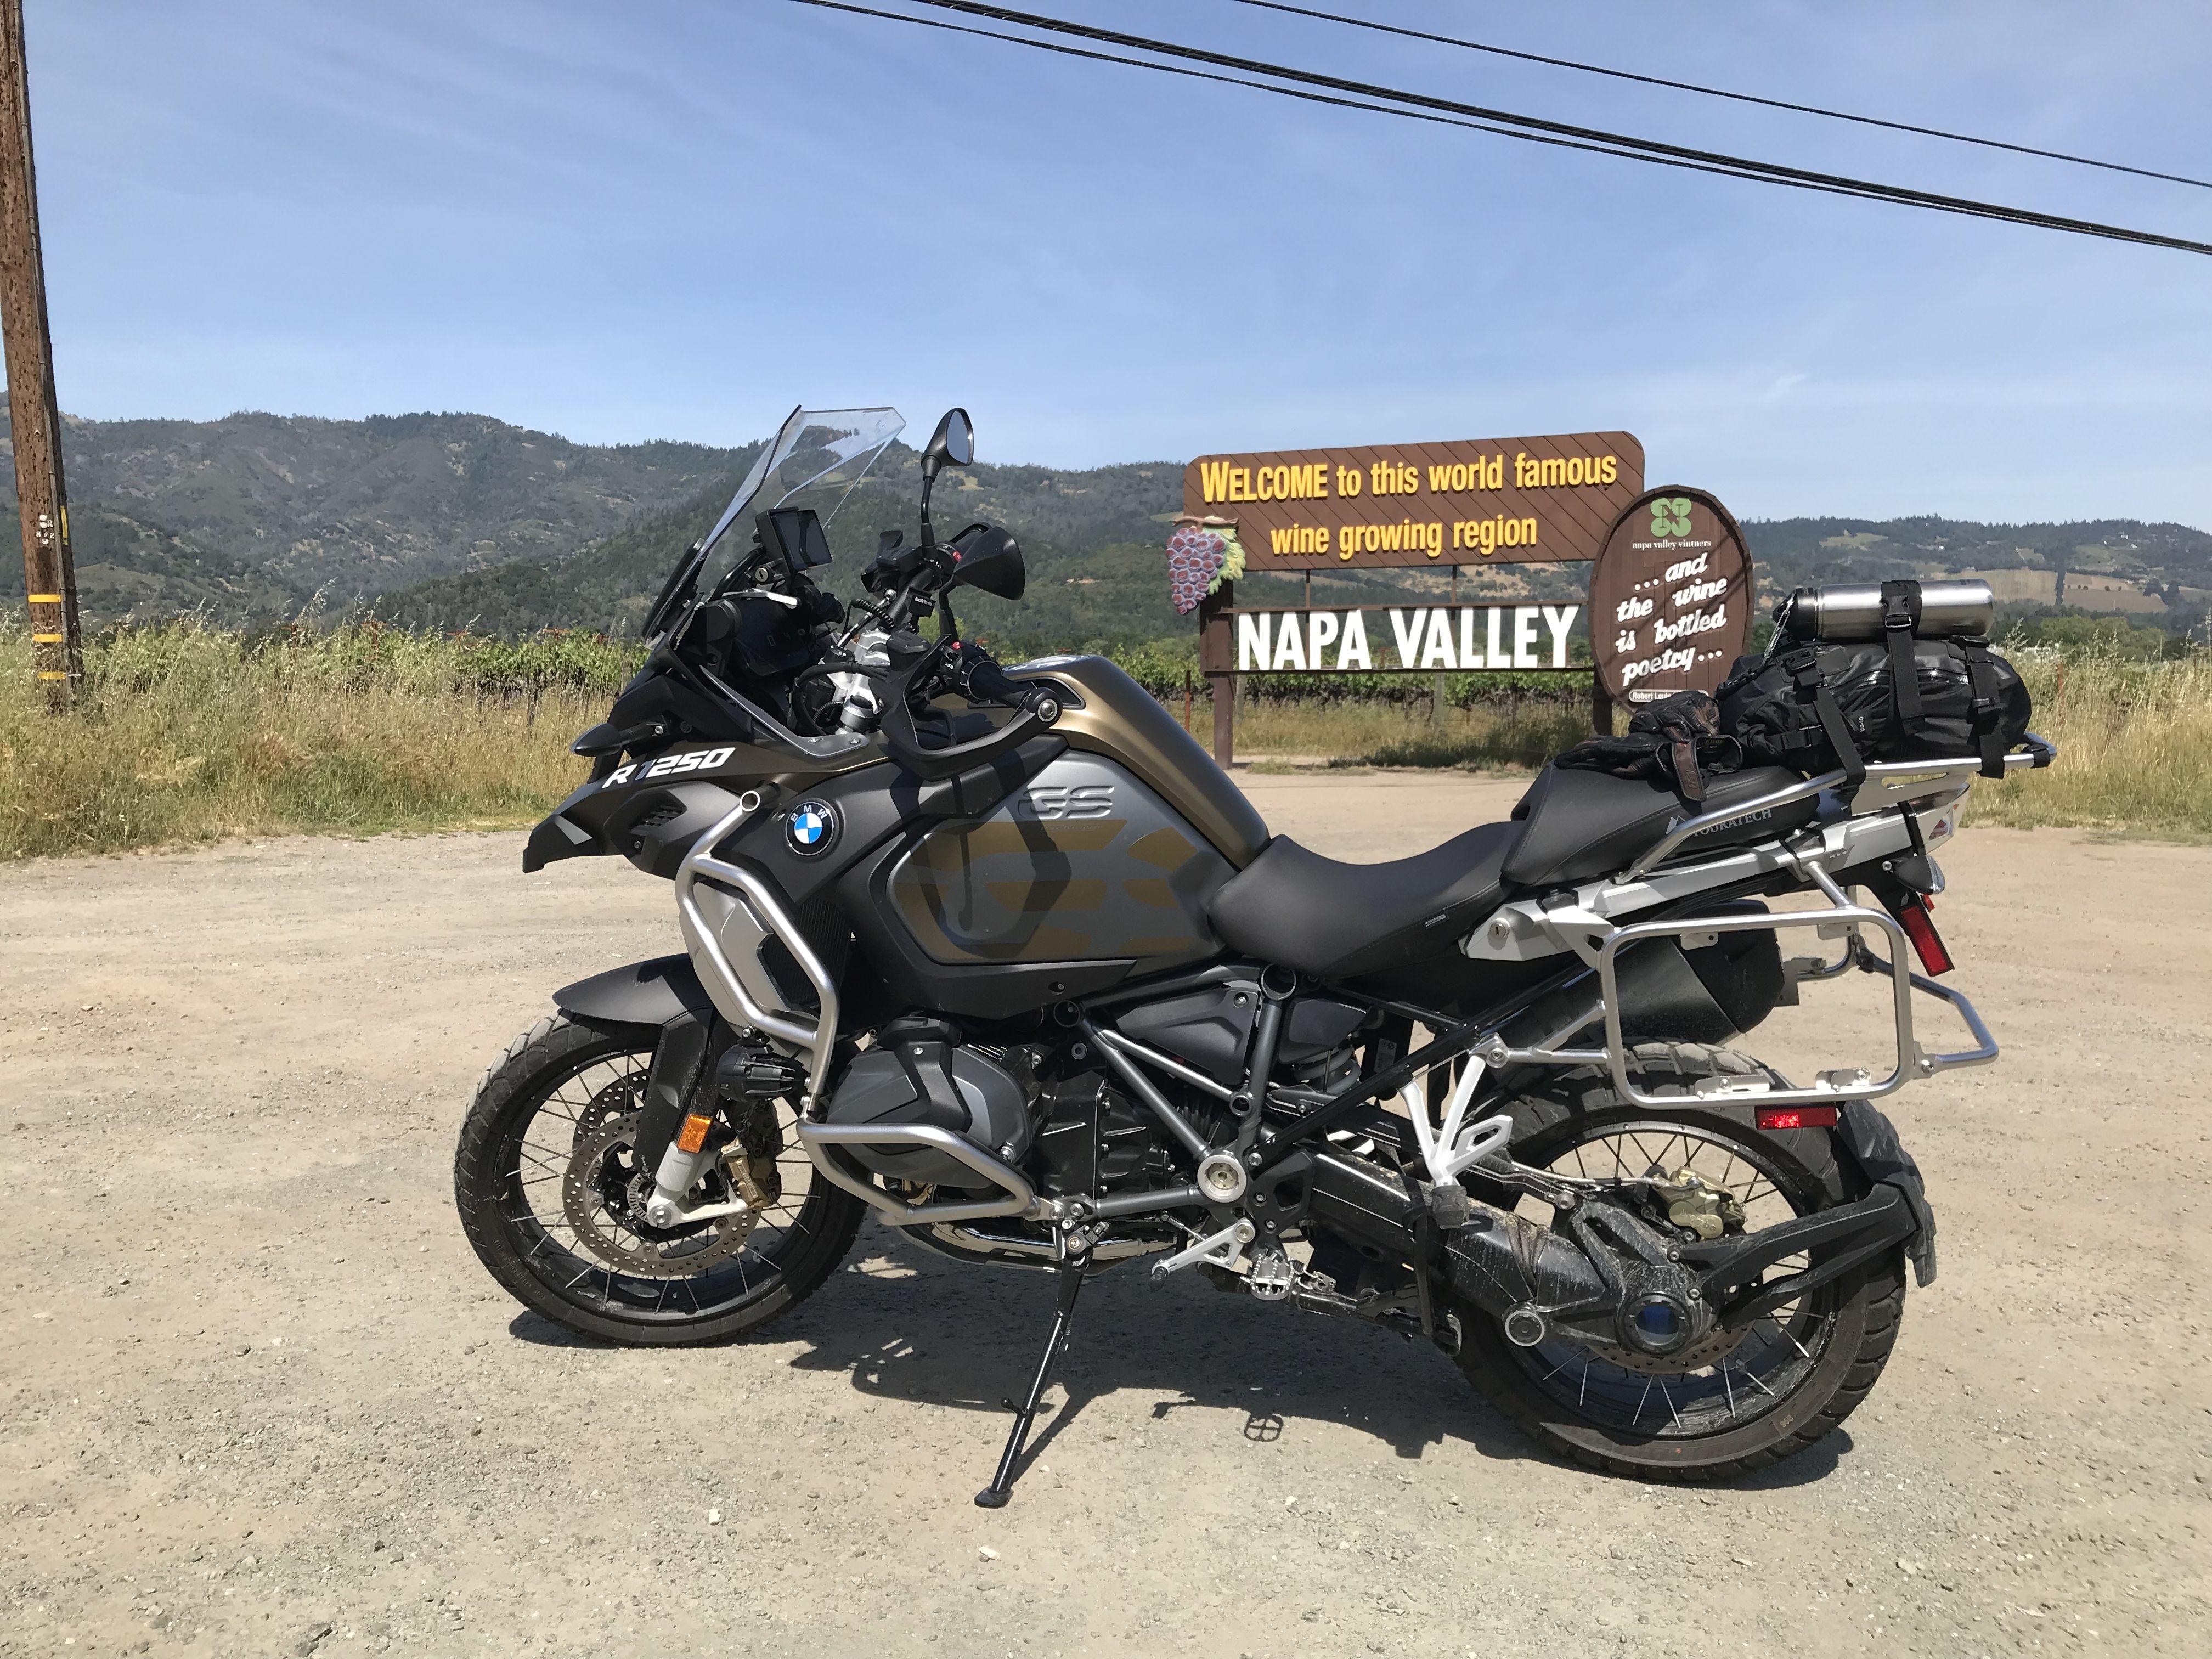 2019 Bmw R1250 Gsa Exclusive Bmw Adventure Motorcycling Bmw E36